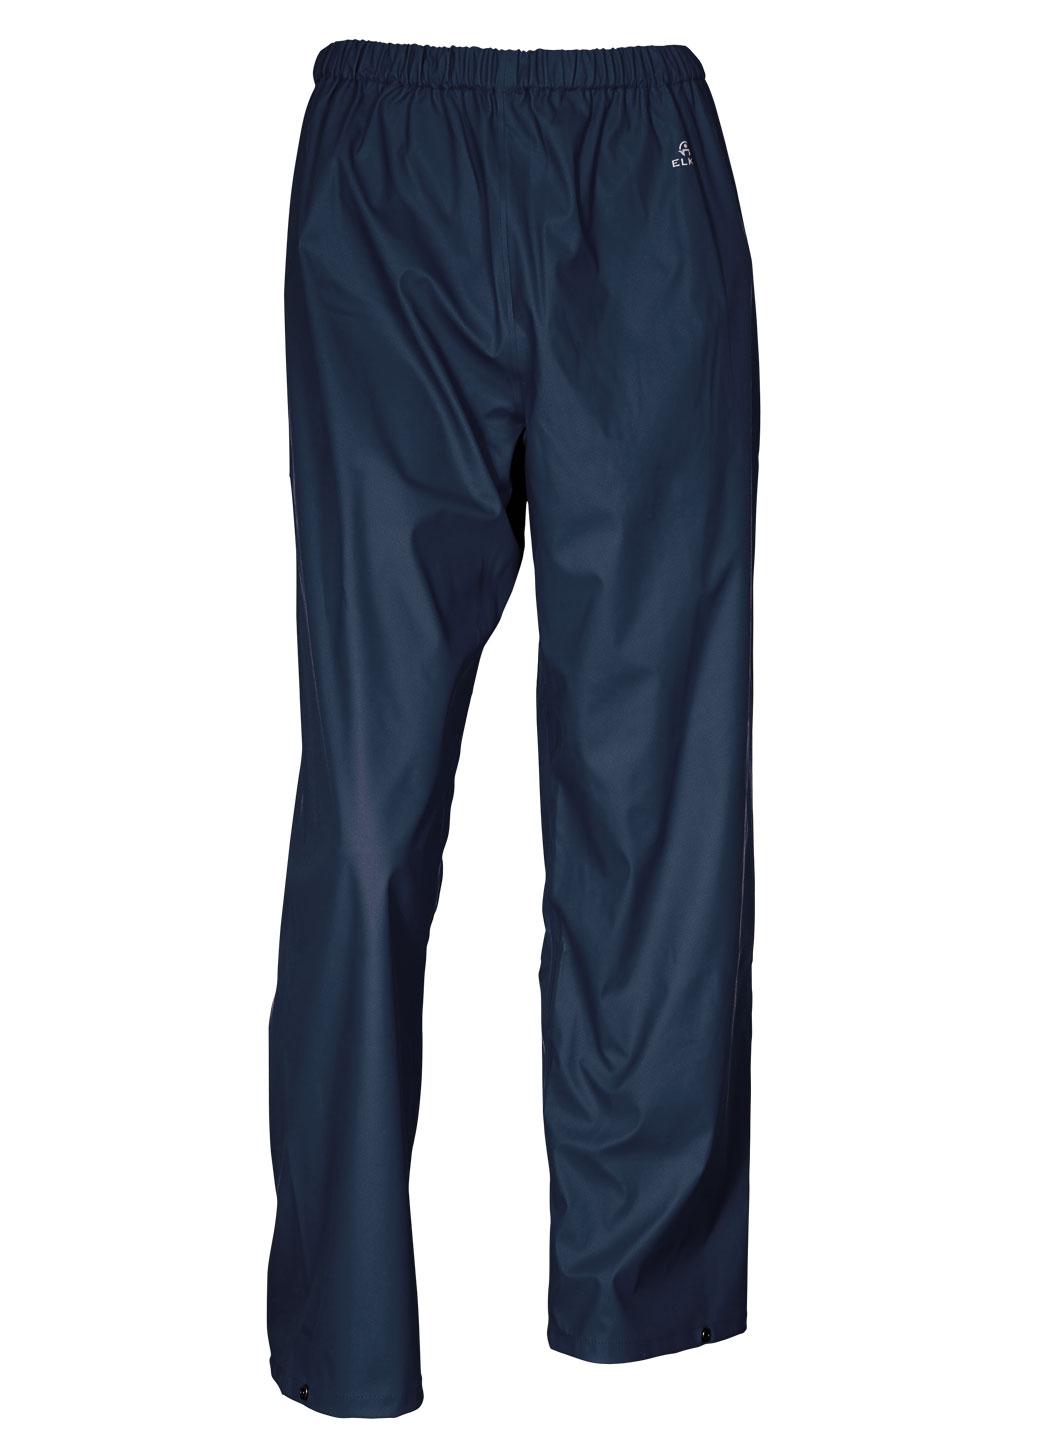 022400007L - DryZone PU Waist Trousers Image